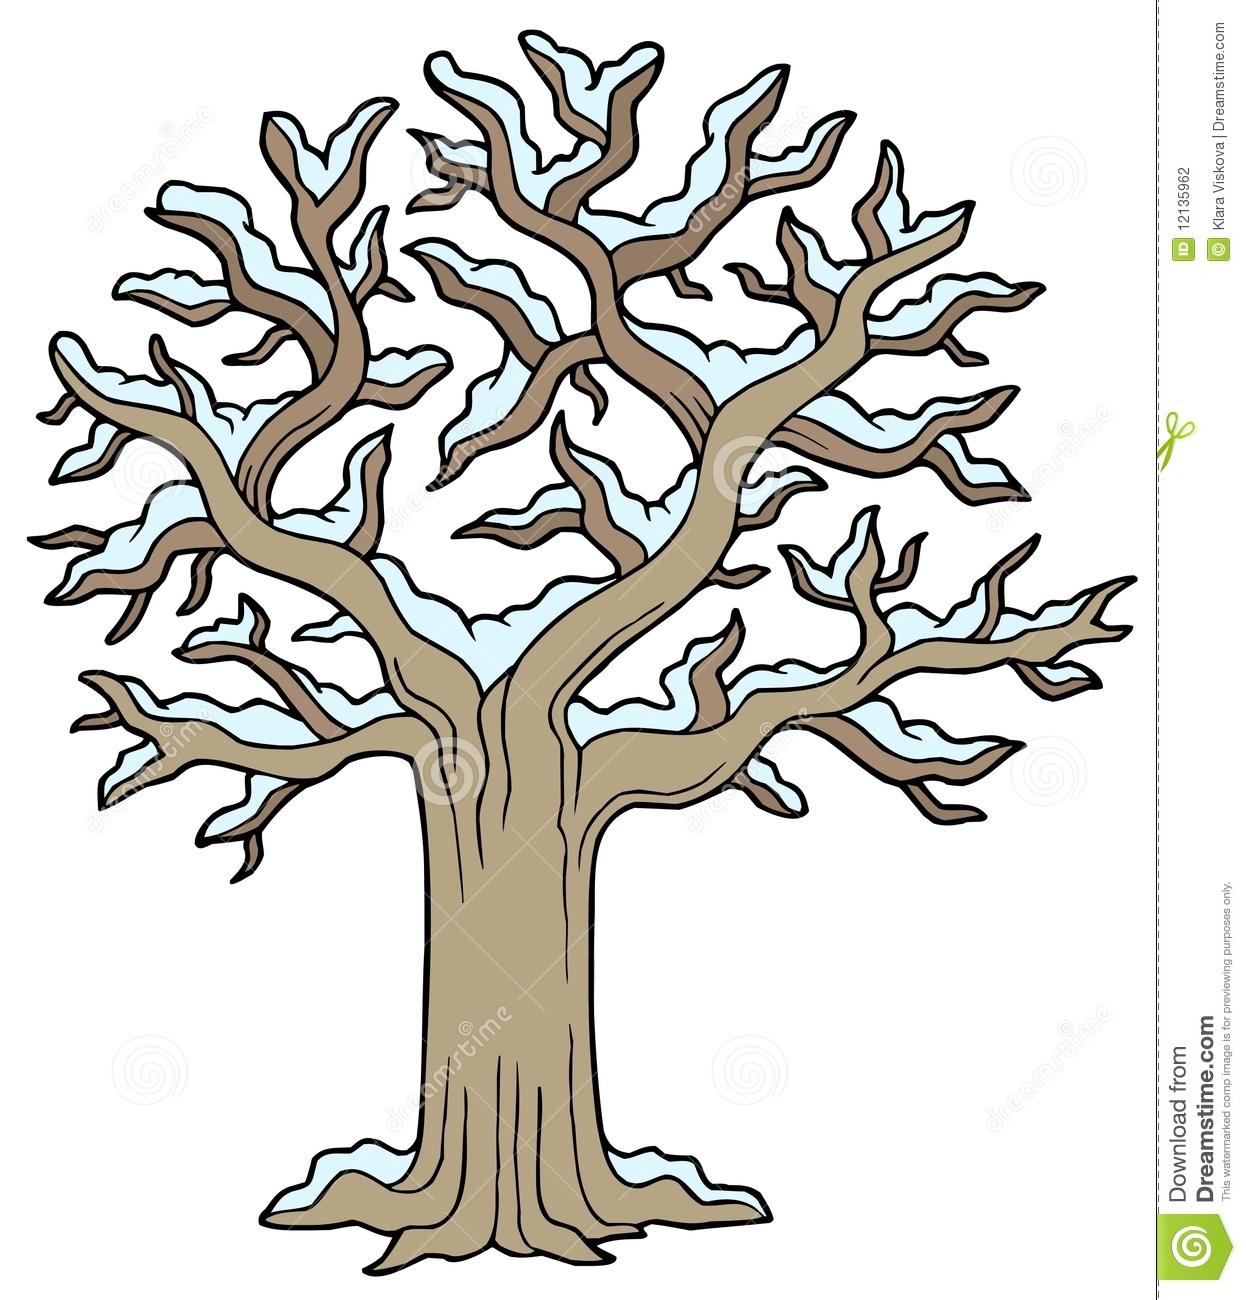 Winter trees clipart free clip art free Winter trees clipart 5 » Clipart Station clip art free